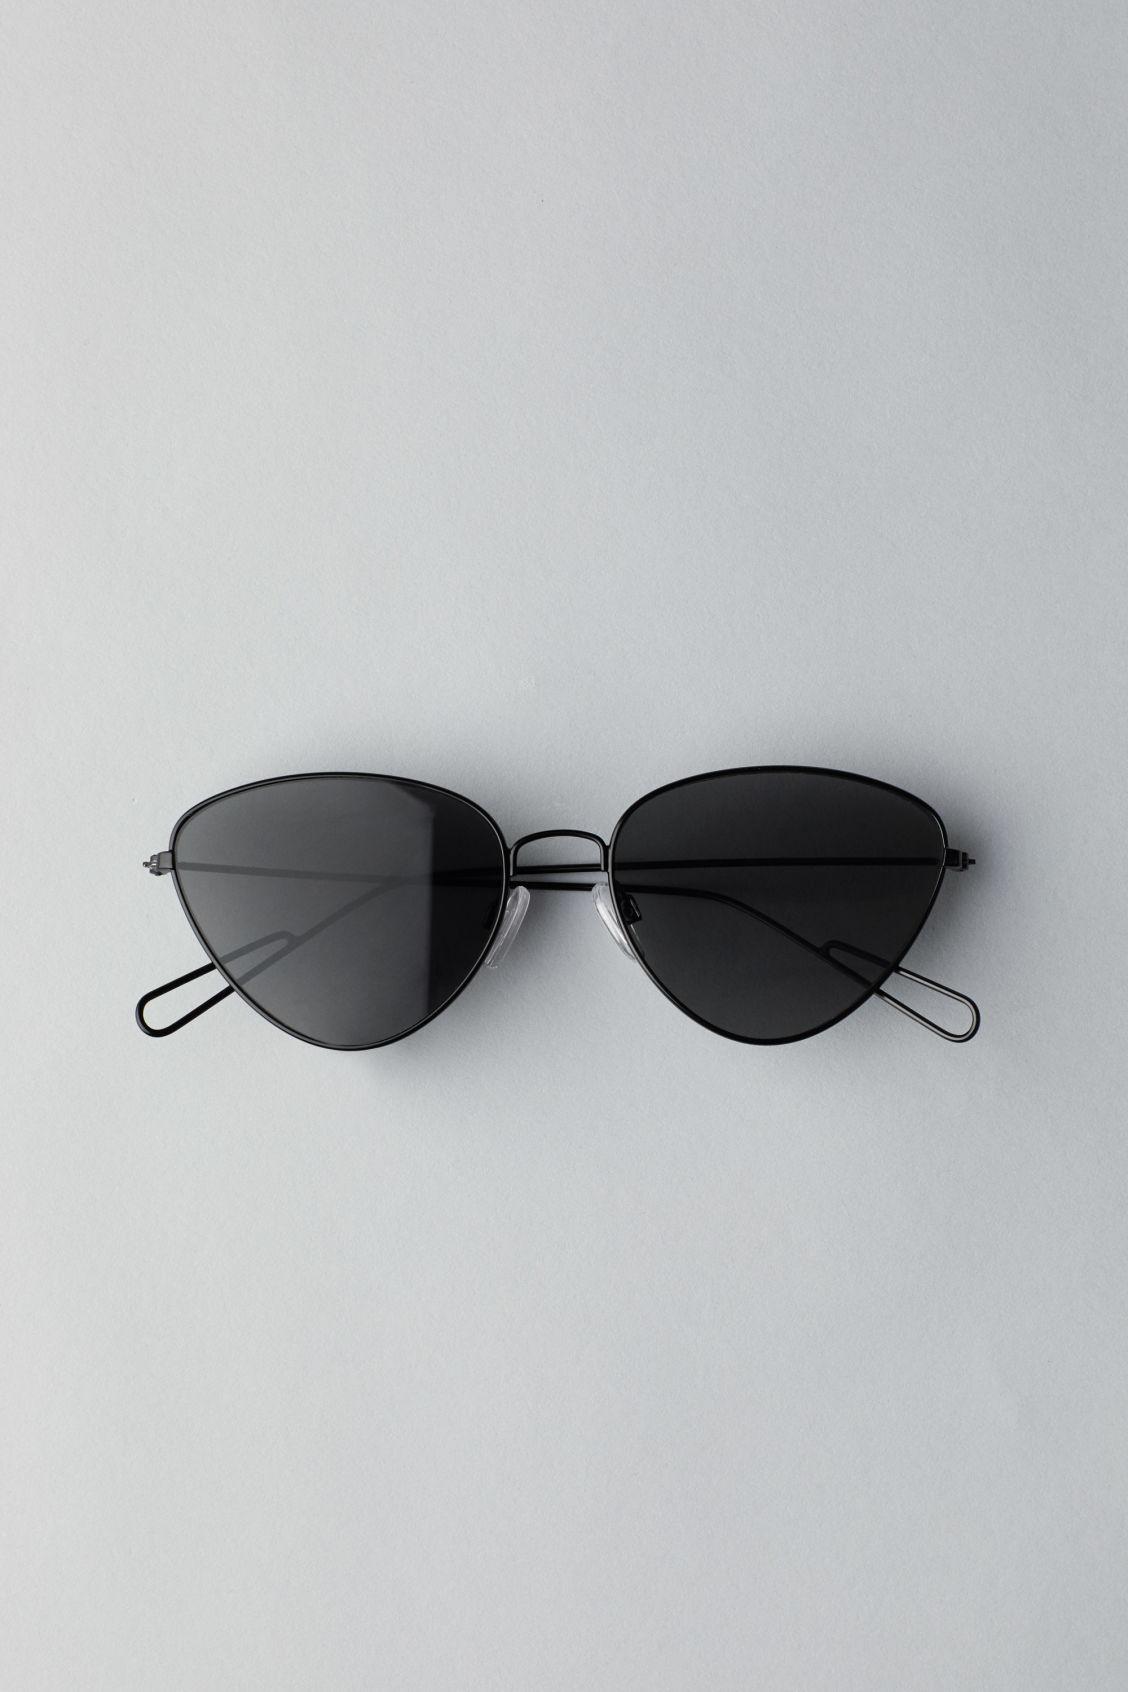 Weekday Taxi Cateye Sunglasses - Black rqQ03W